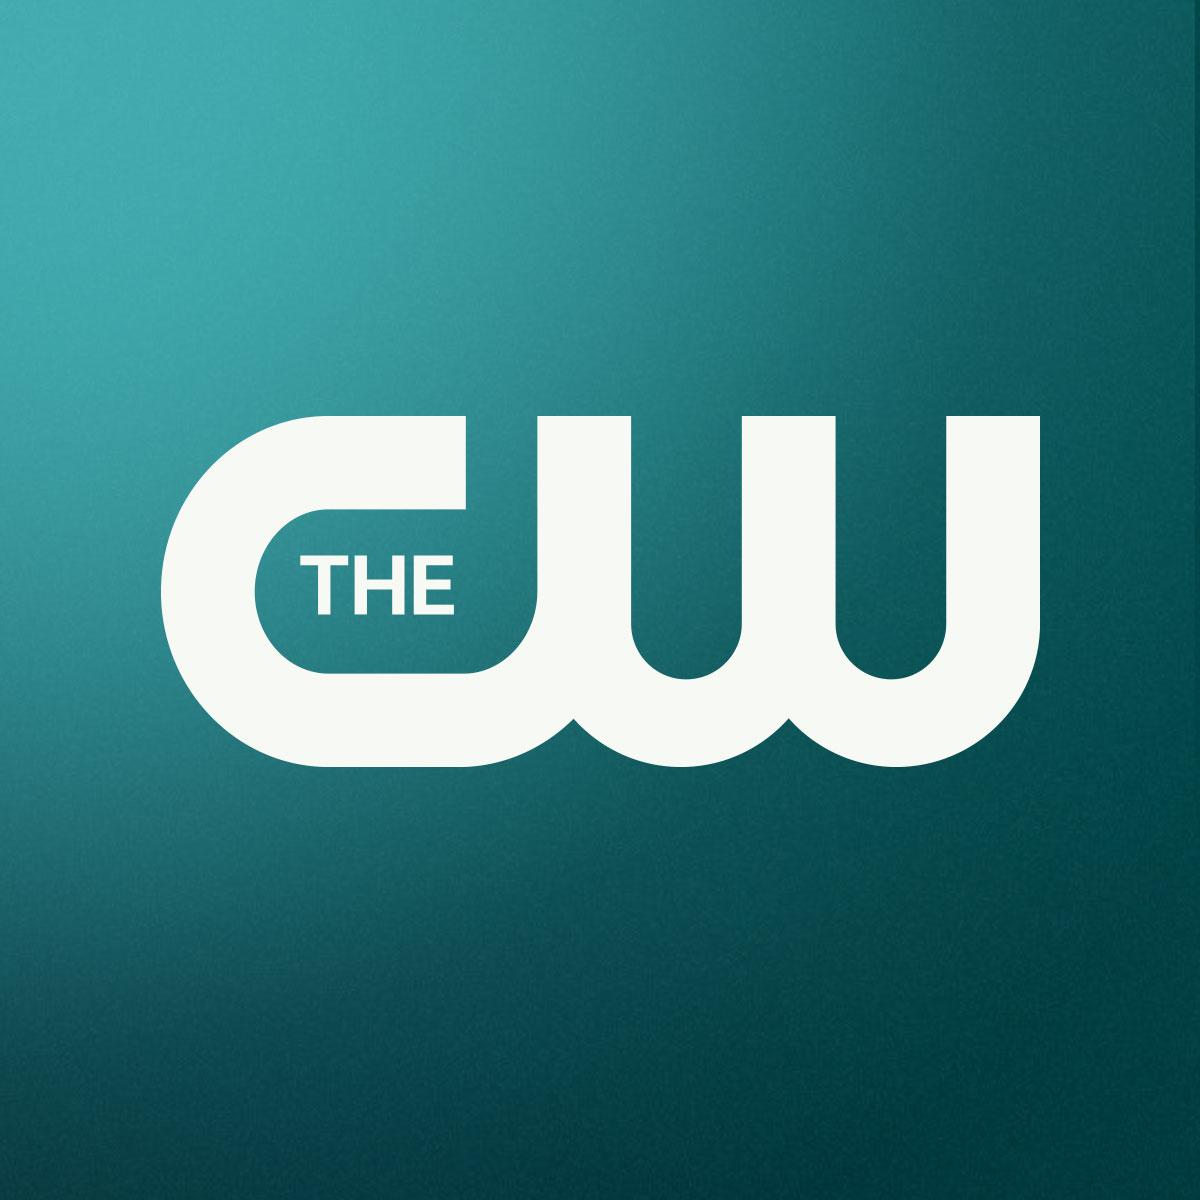 The CW tv logo